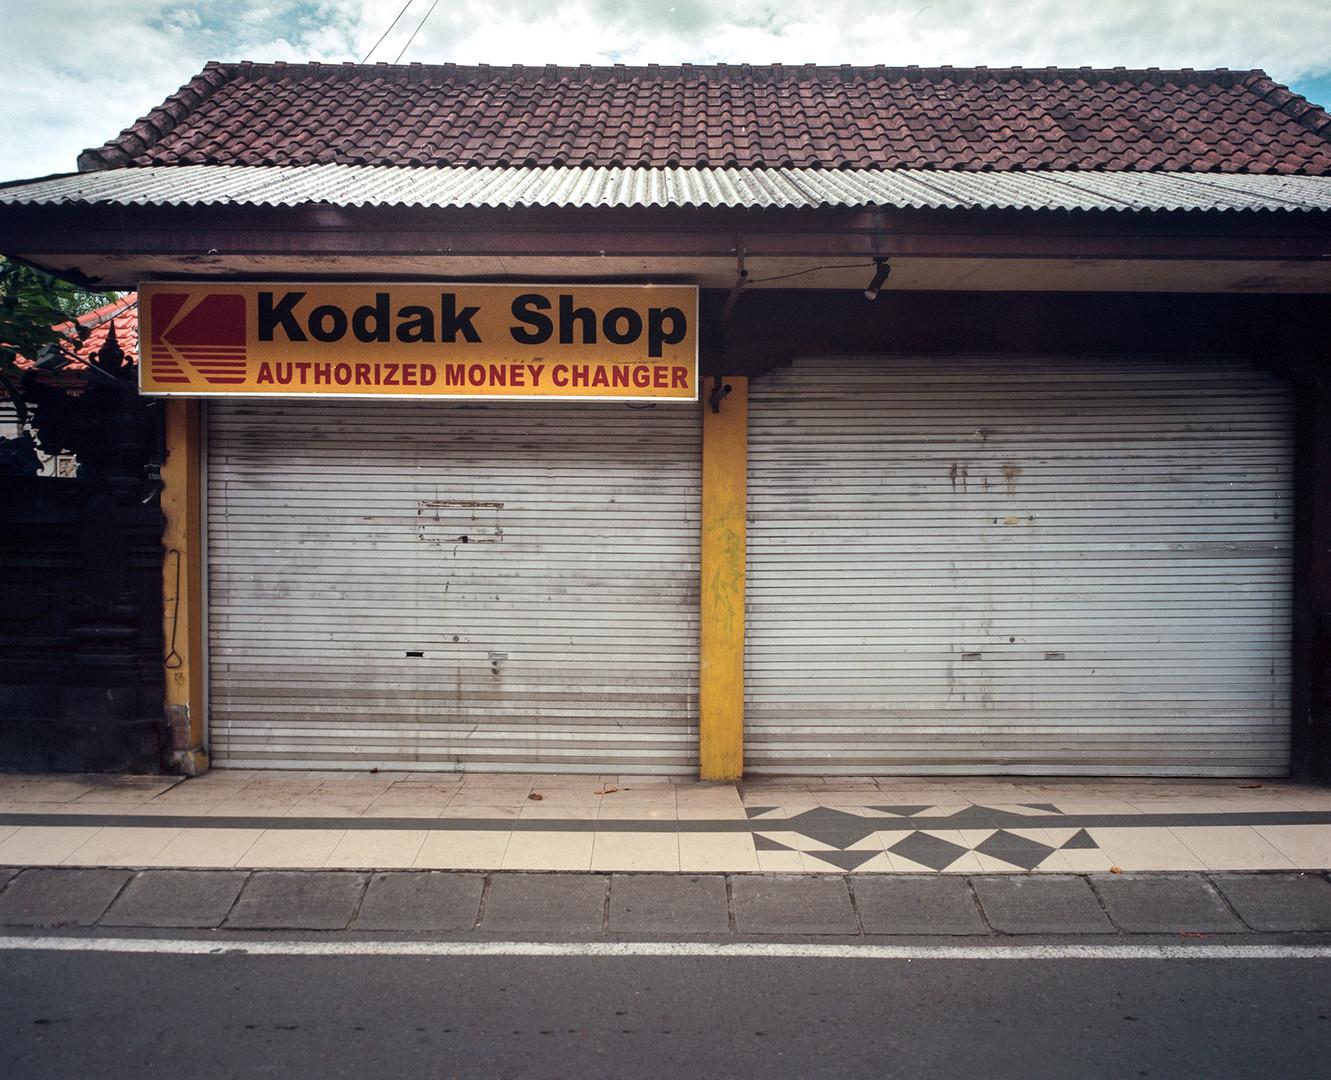 Goodman-zone-camera-shots-Bali-11.jpg